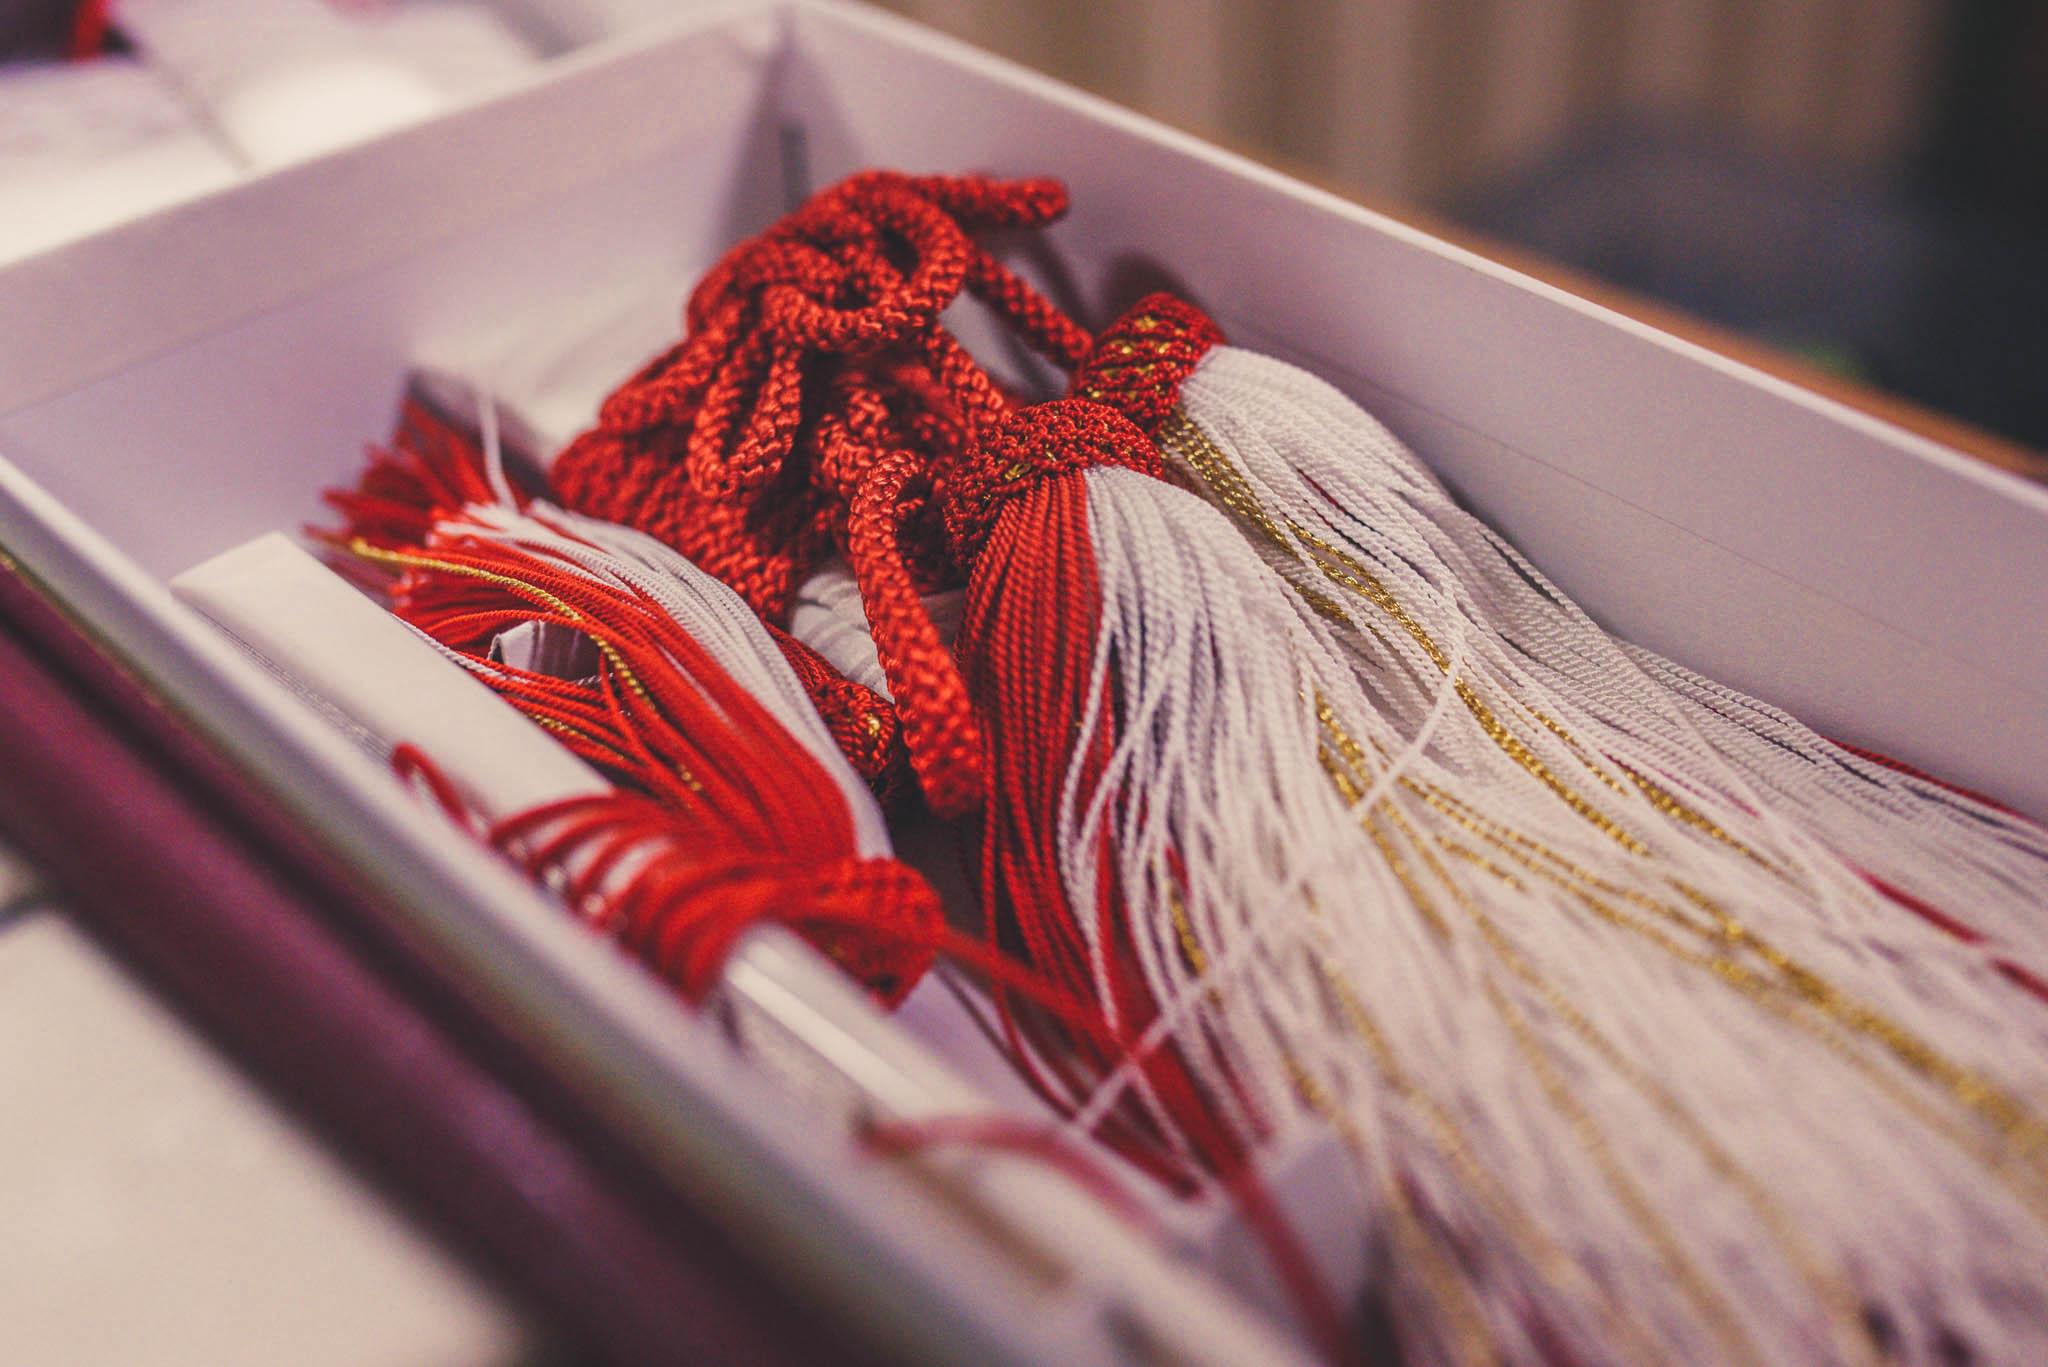 japan-wedding-photography-by-roberto-panciatici-photography-11